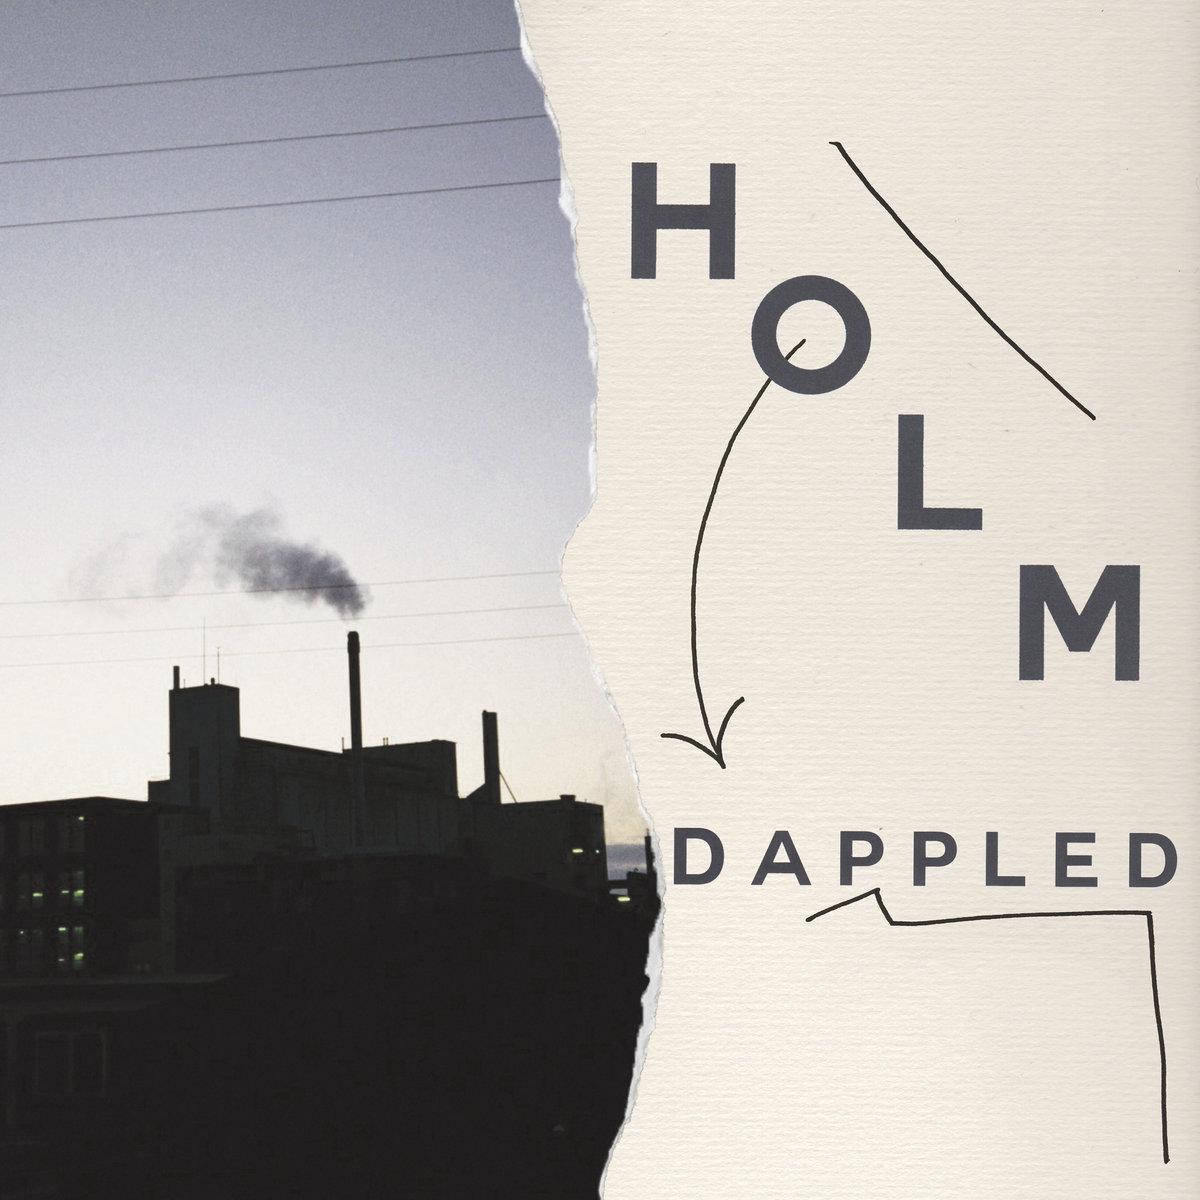 Holm - Dappled 12